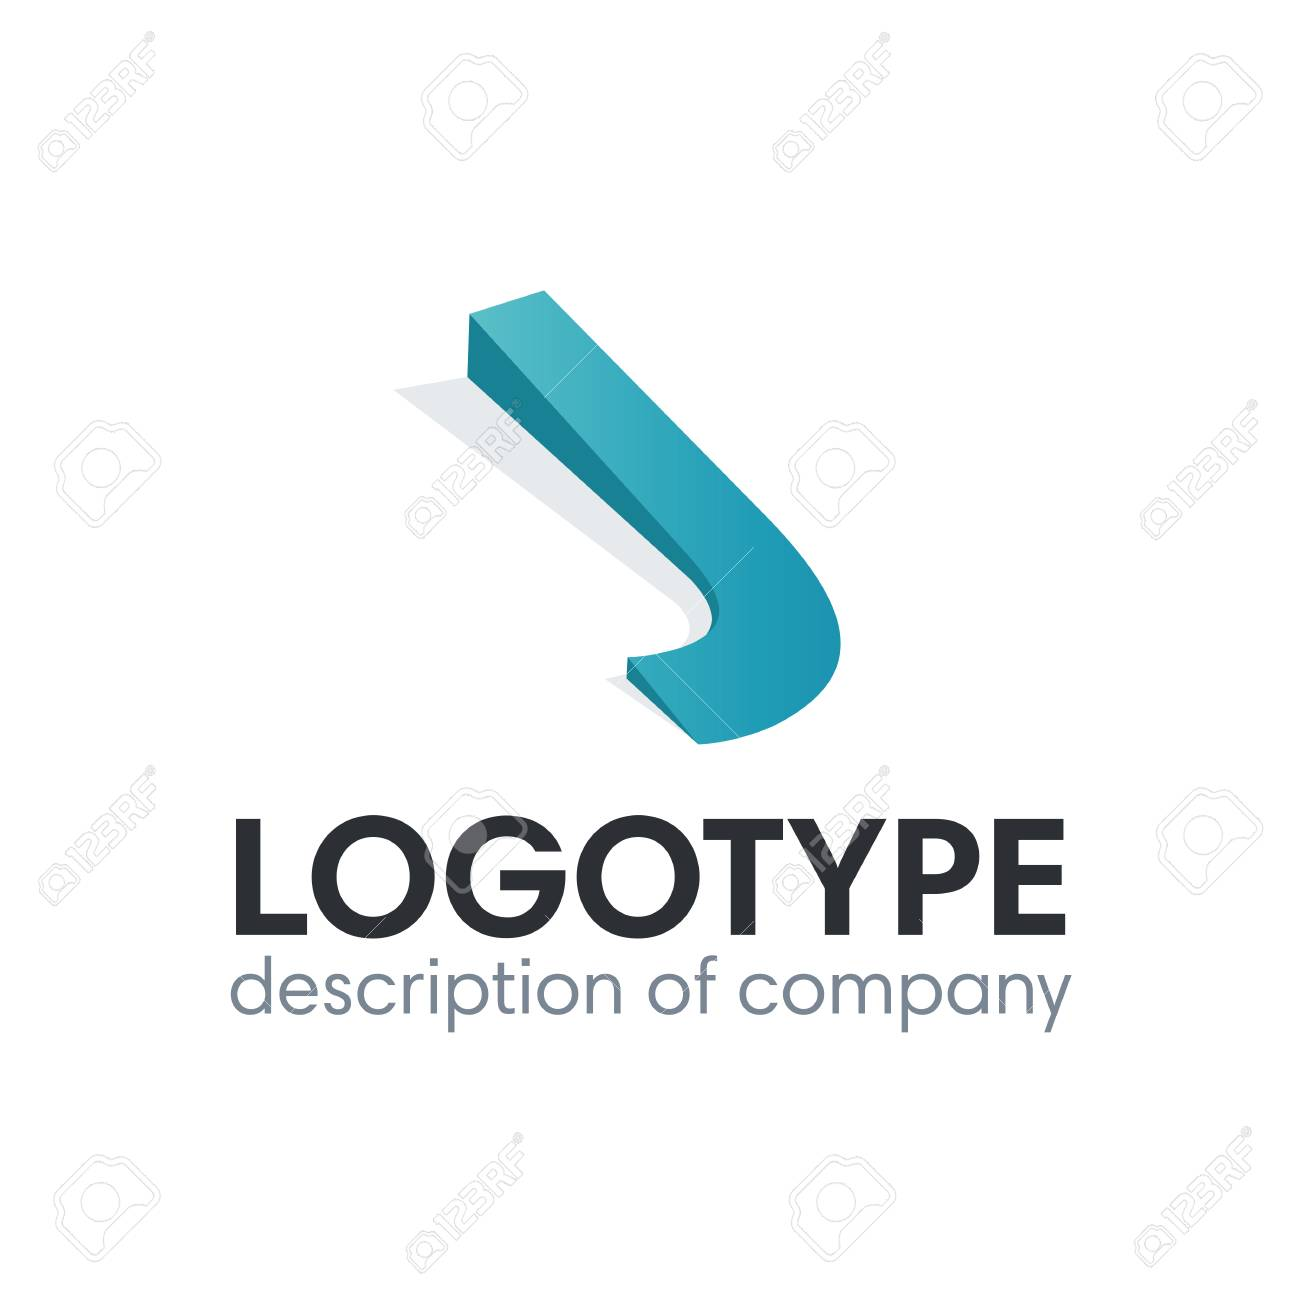 Letter J logo icon design template elements - 84049332